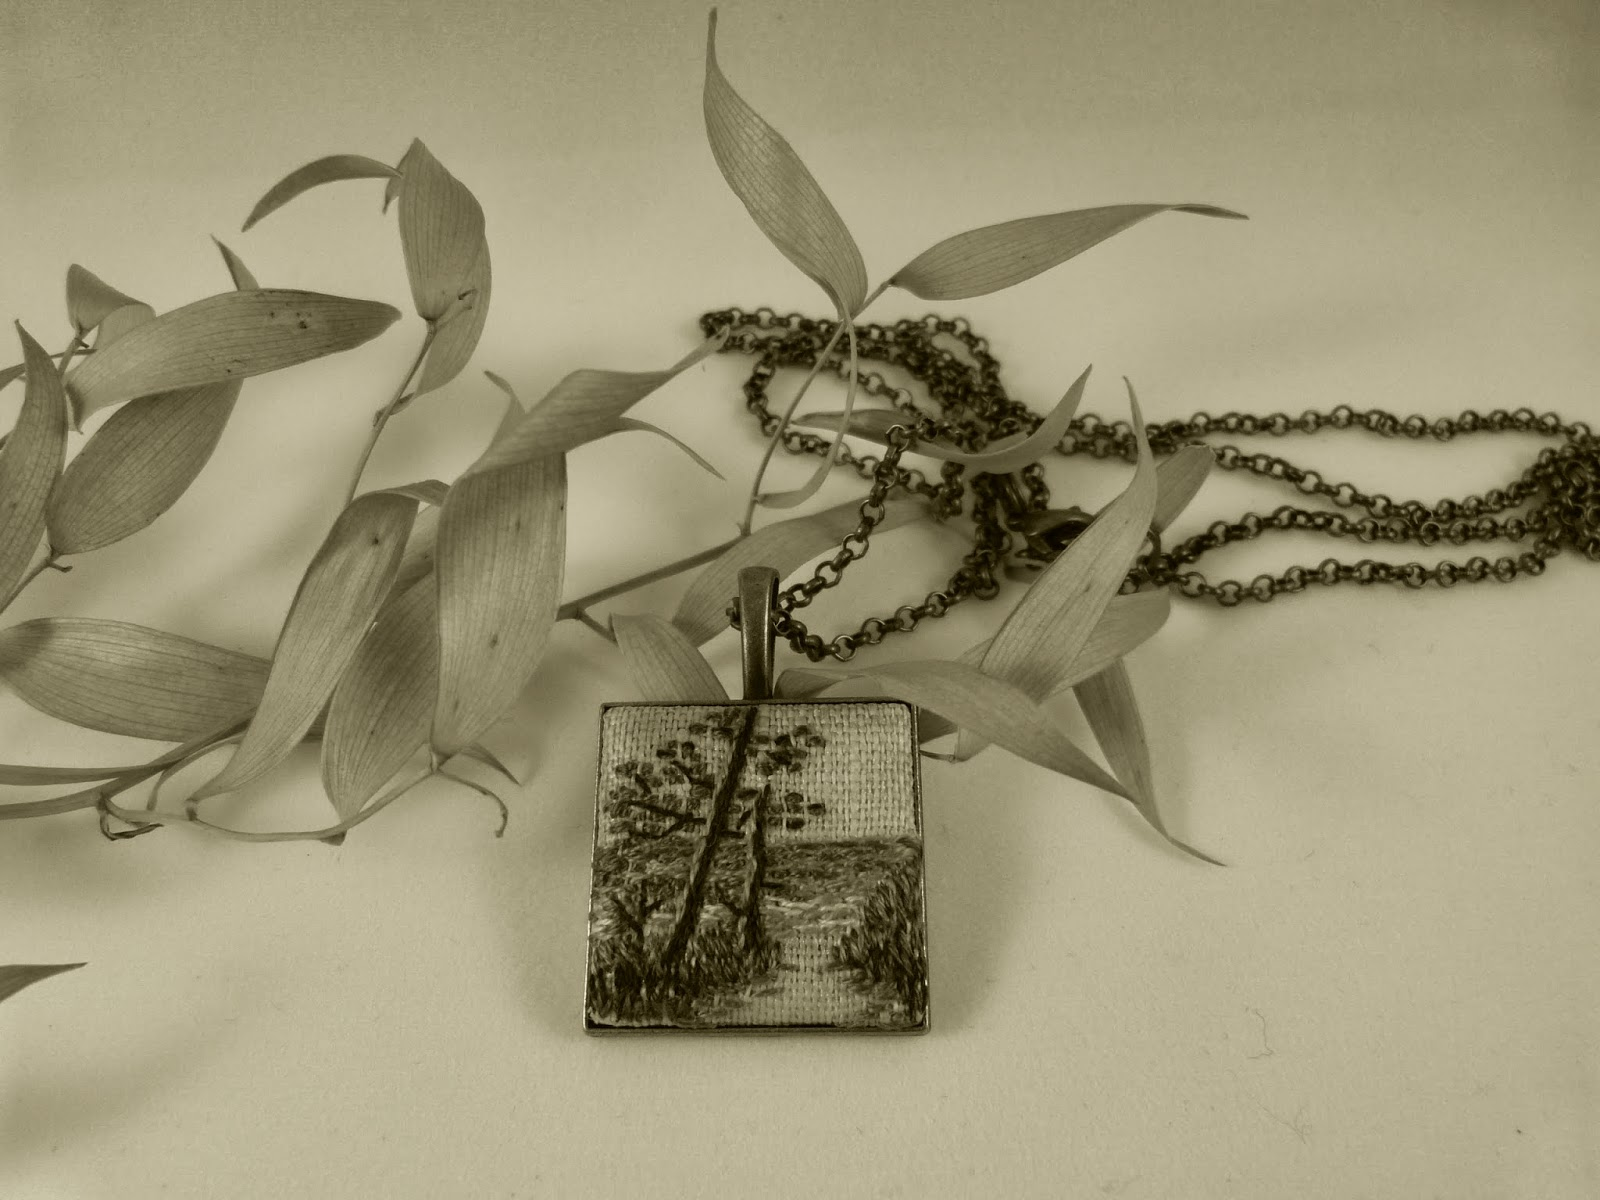 haft płaki, embroidered pendant, haftowany krajobraz, haftowany naszyjnik, naszyjnik z haftem, embroidered jewerly, naszyjnik vintage, medalion z haftem, handmade jewerly